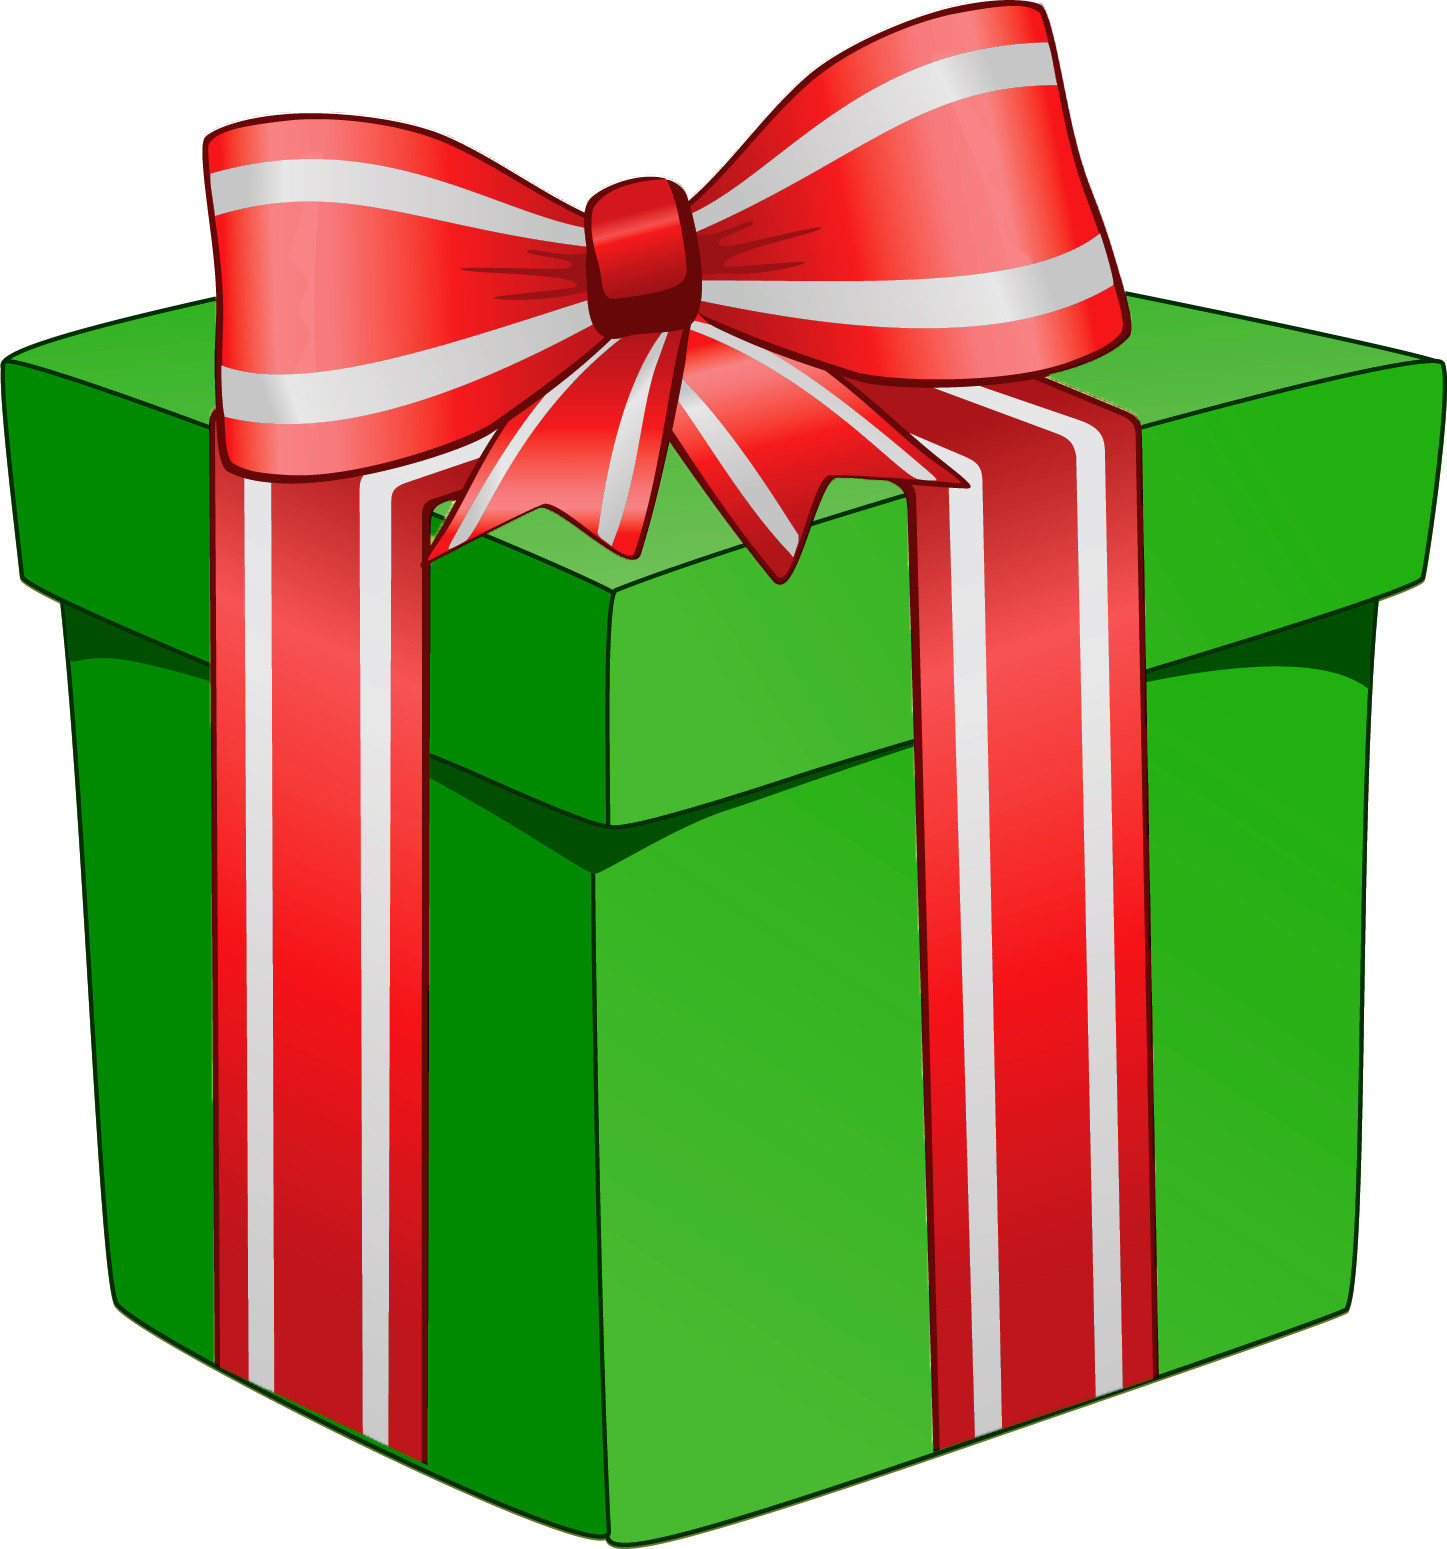 Xmas Stuff For Christmas Gift Boxes Clip-Xmas Stuff For Christmas Gift Boxes Clip Art-16